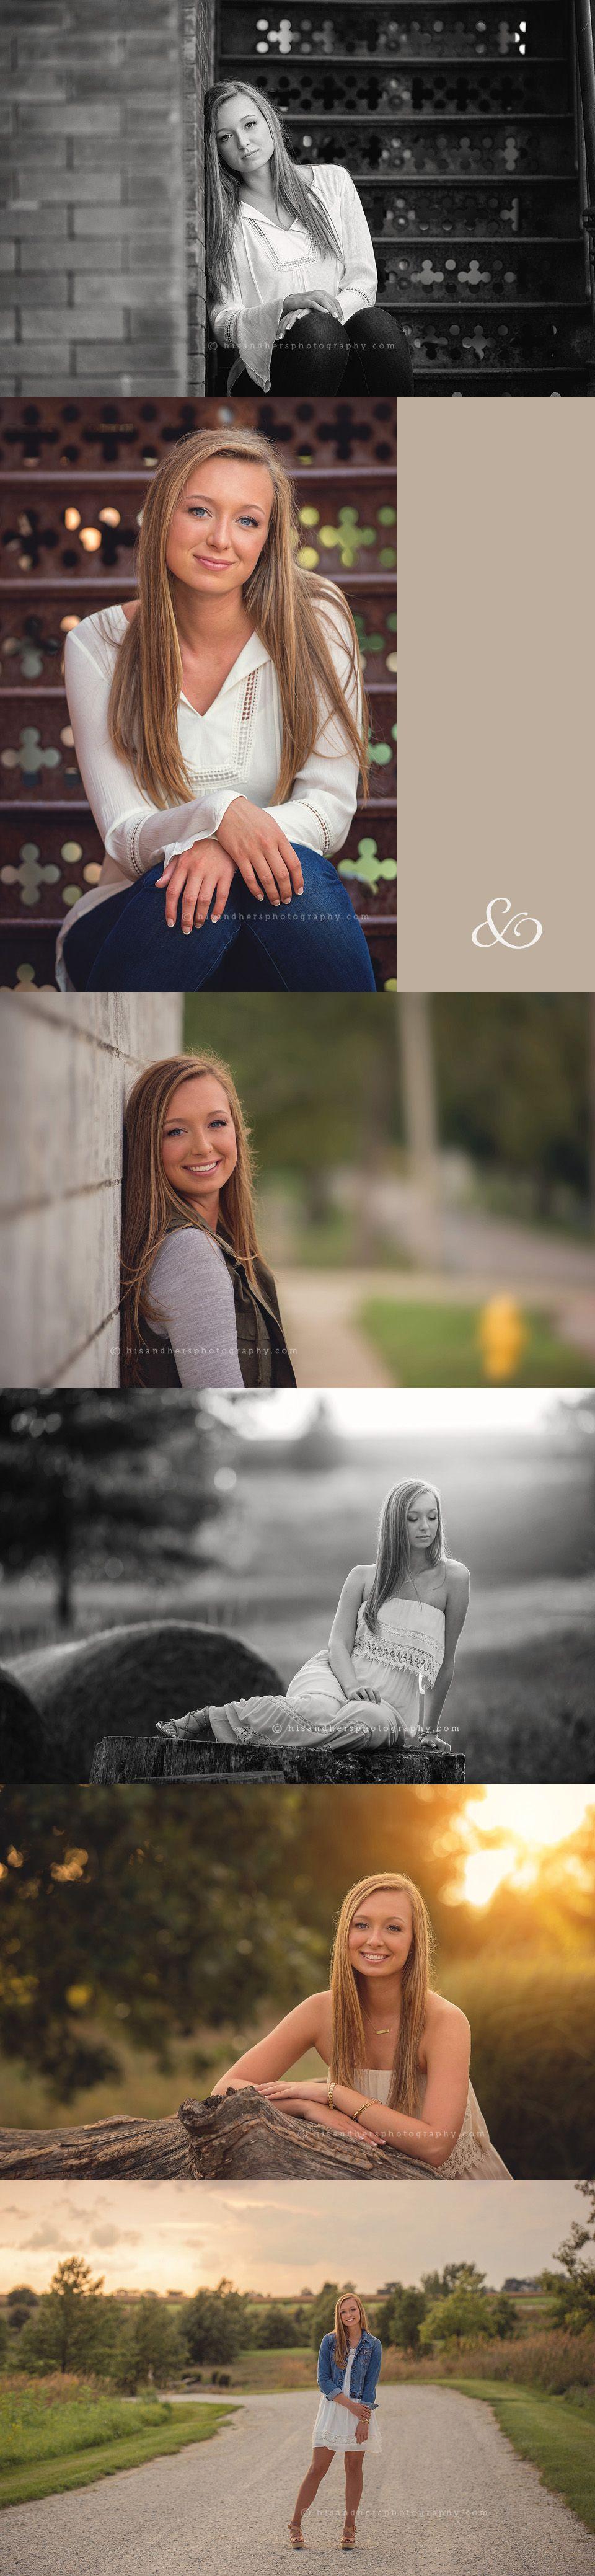 Senior | Haley, class of 2017